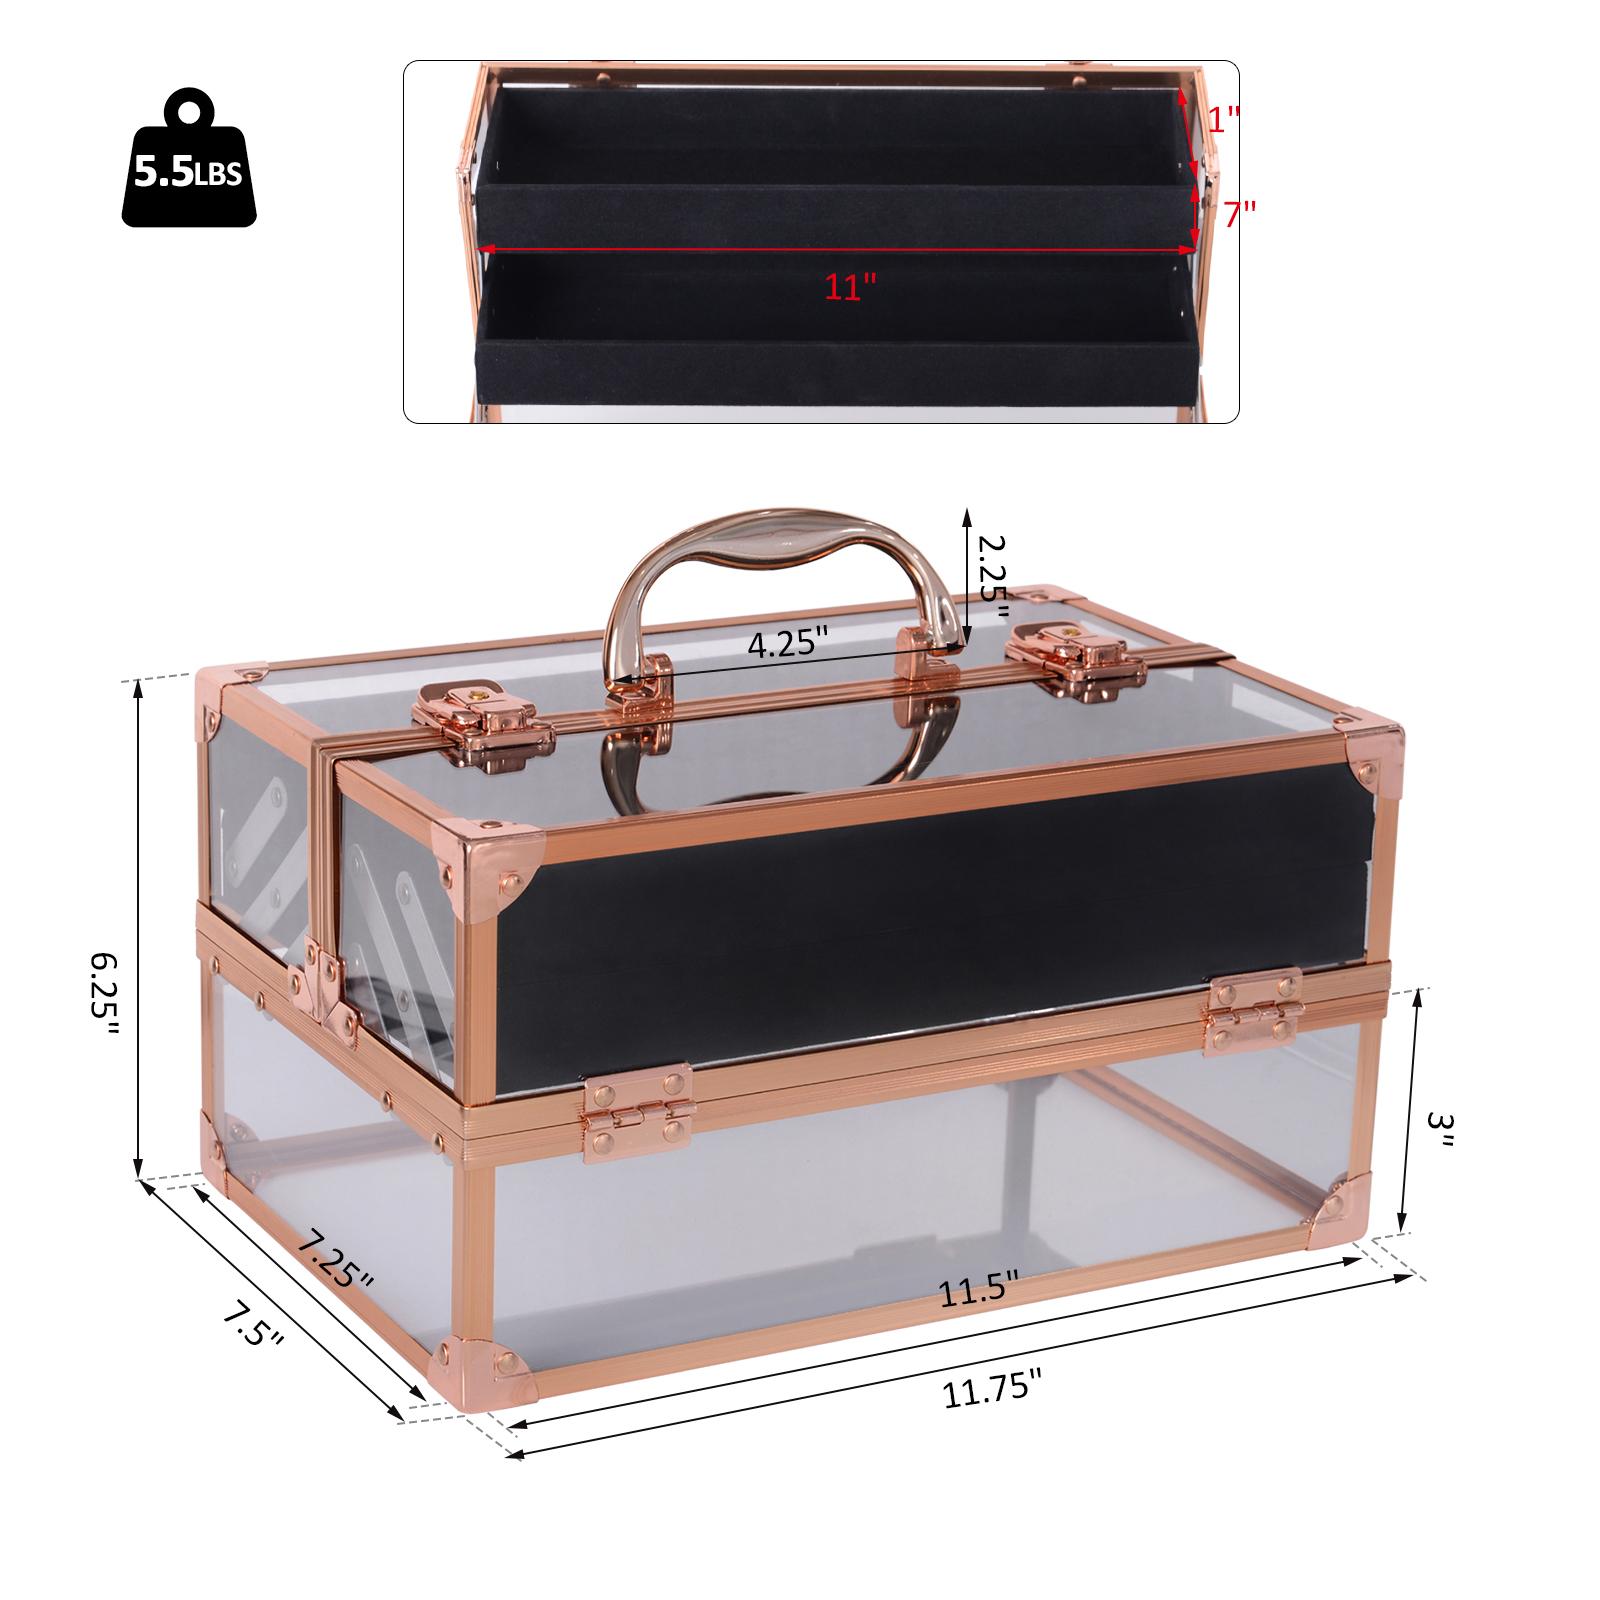 Portable-Makeup-Case-Train-Case-Lockable-Aluminum-with-4-Trays thumbnail 10